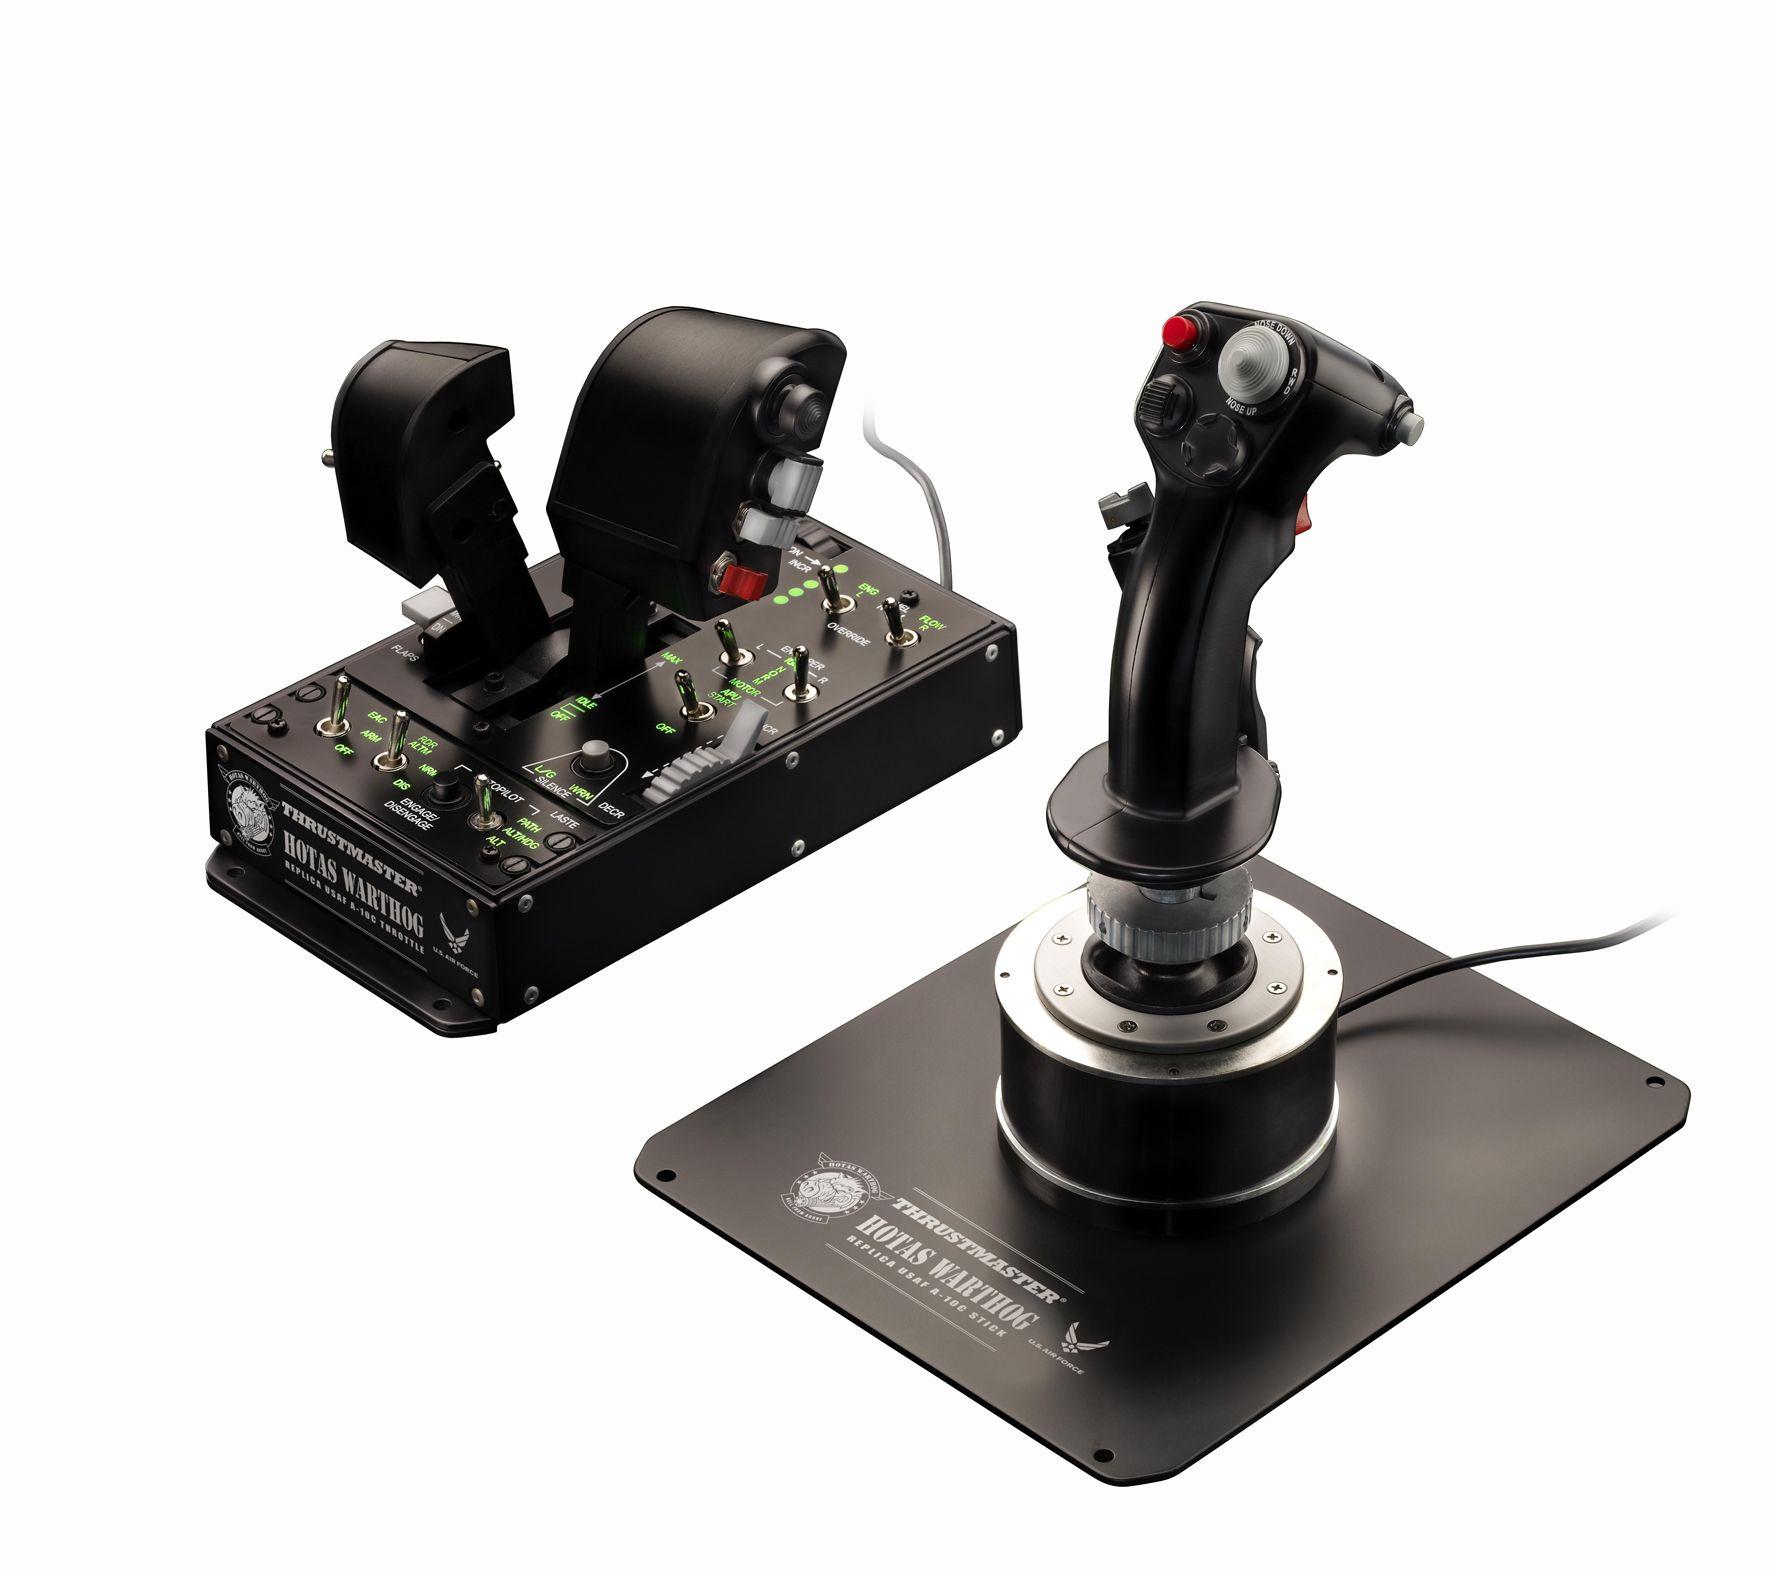 The Thrustmaster HOTAS Warthog Joystick and throttle fully